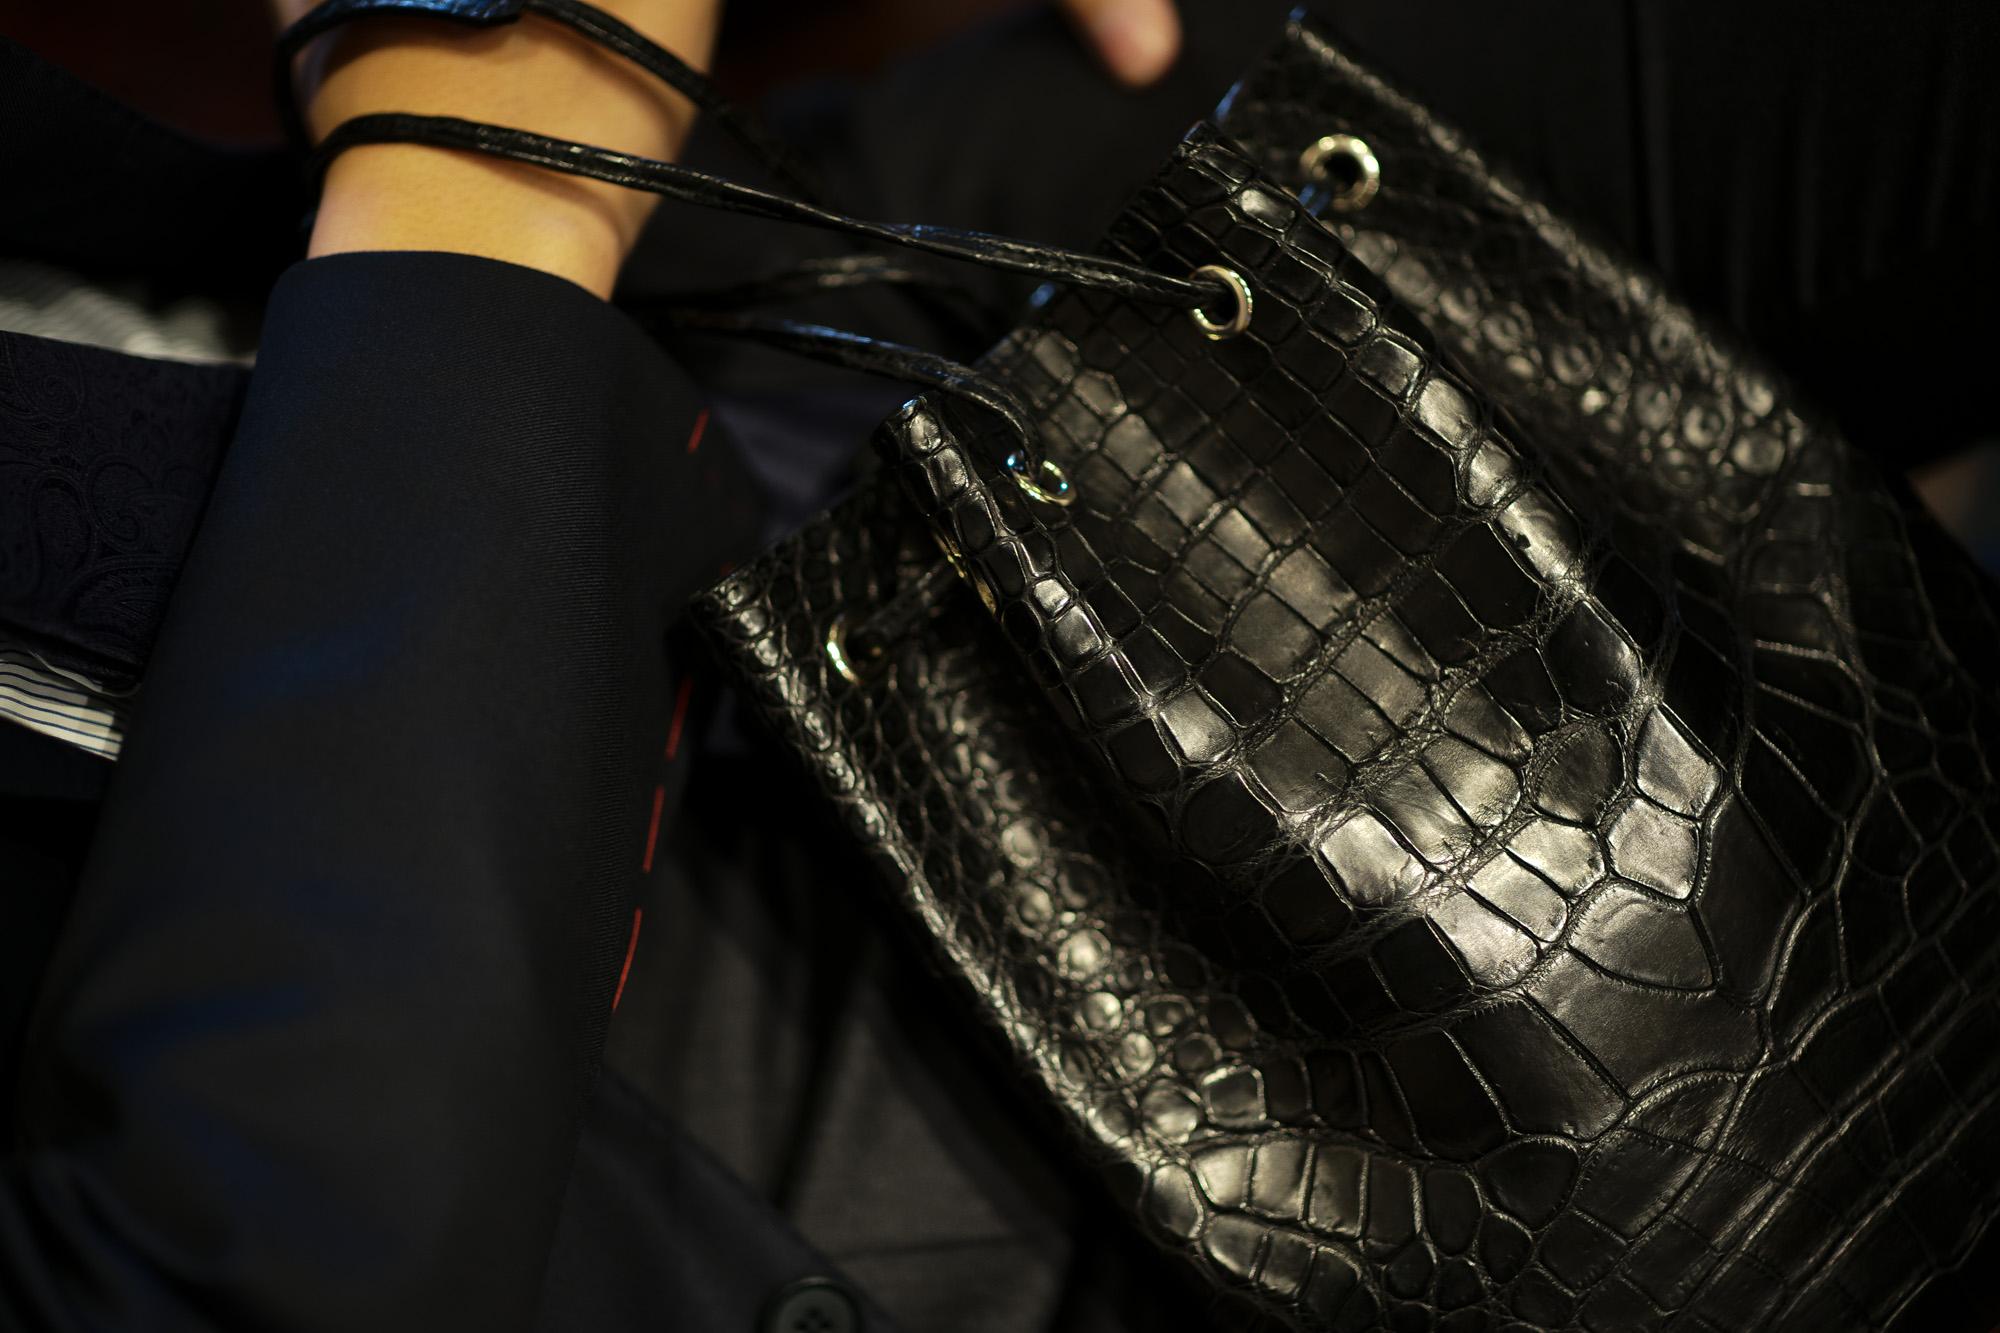 Cisei × 山本製鞄 (シセイ × 山本製鞄) Crocodile Bag(クロコダイルバック) Nile Crocodile Leather (ワニ革) ナイル クロコダイル レザードローストリングバック 巾着  BLACK(ブラック)  Made in Japan (日本製) 2019 秋冬 【超絶 限定モデル】【ご予約開始】愛知 名古屋 altoediritto アルトエデリット